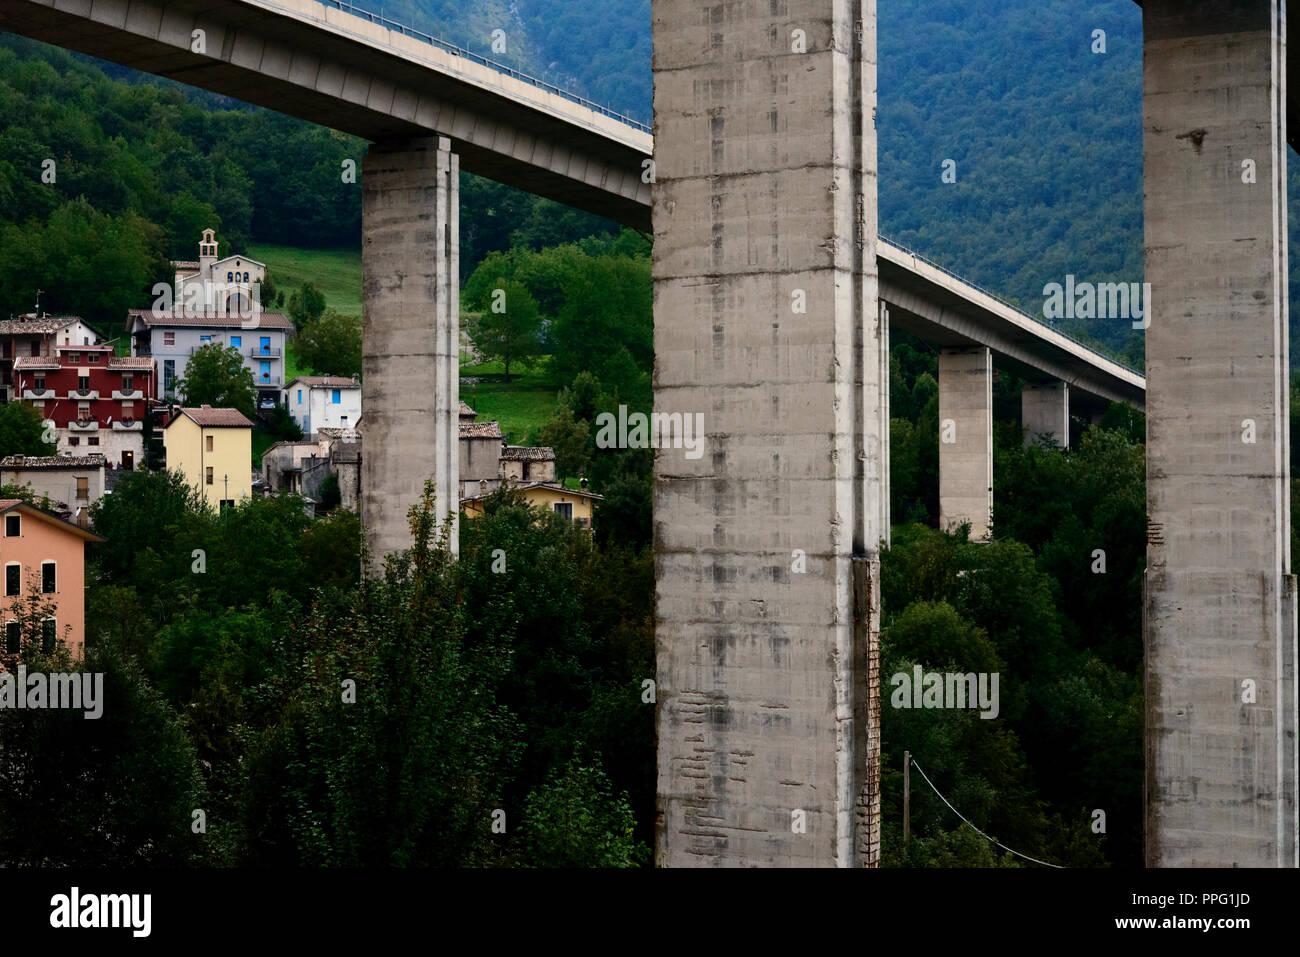 Autostrada ponte sul borgo antico Immagini Stock